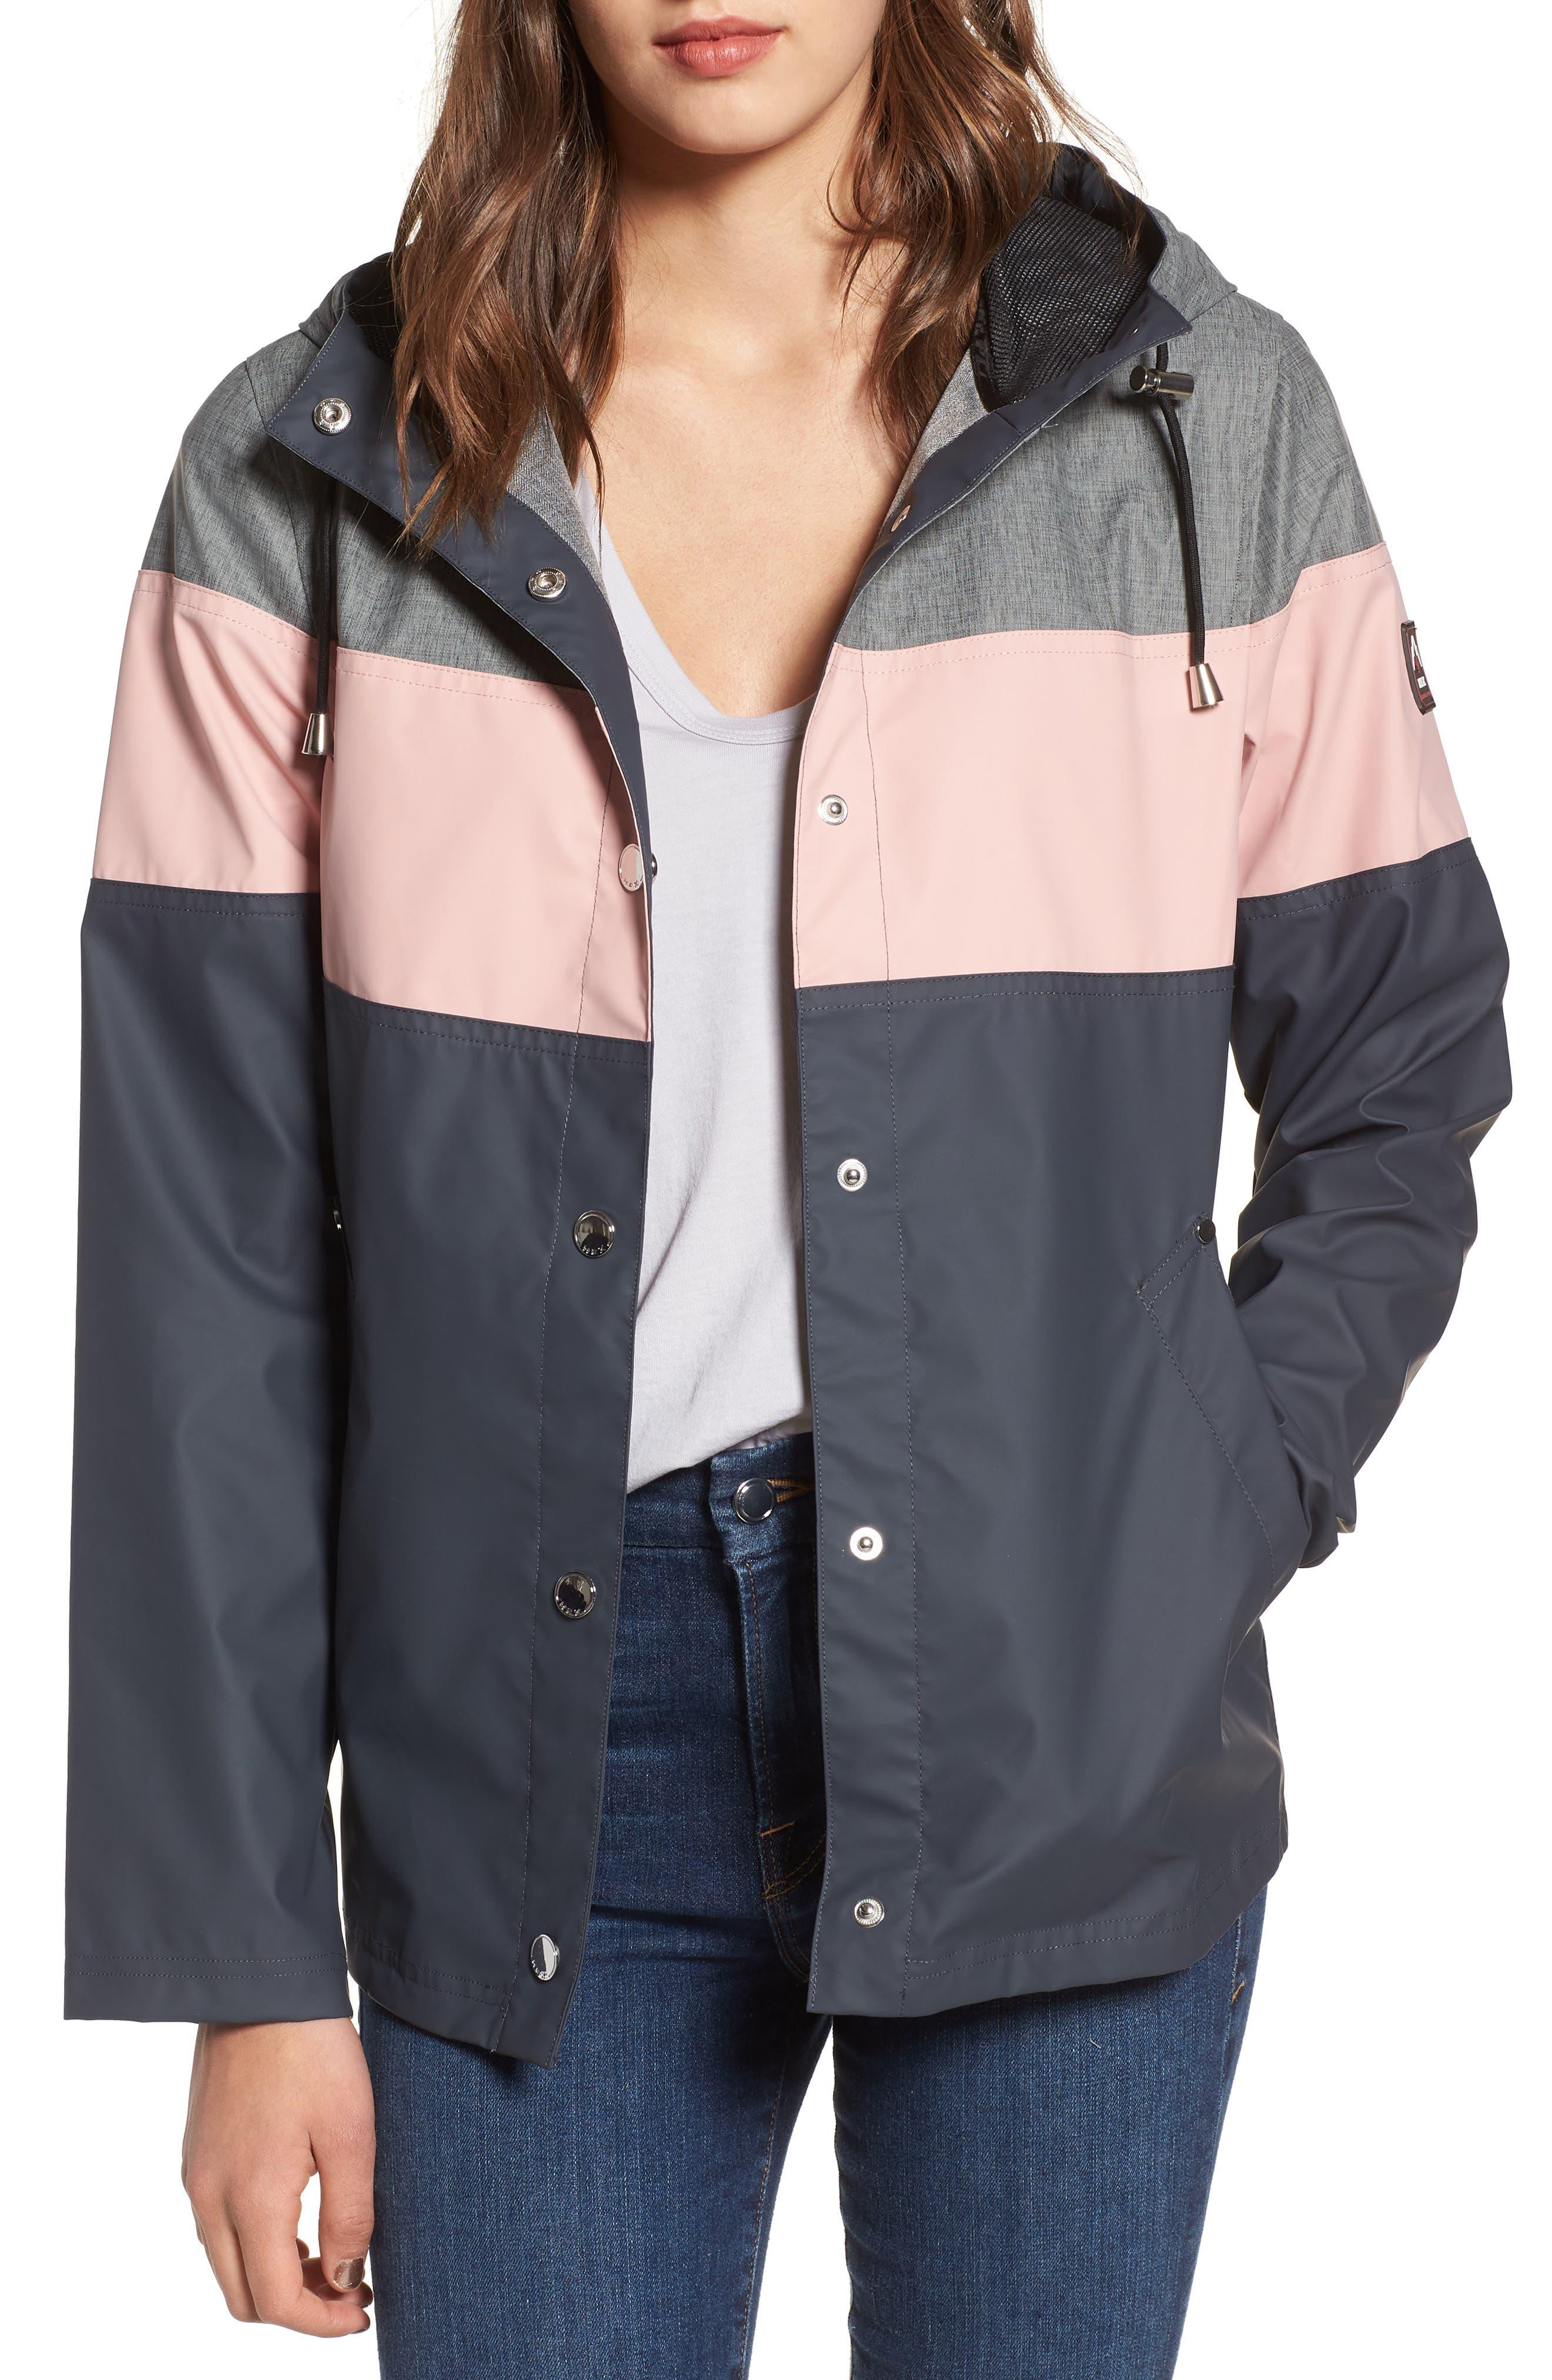 Hooded Raincoat,                             Main thumbnail 1, color,                             Storm/ Blush/ Mech Grey